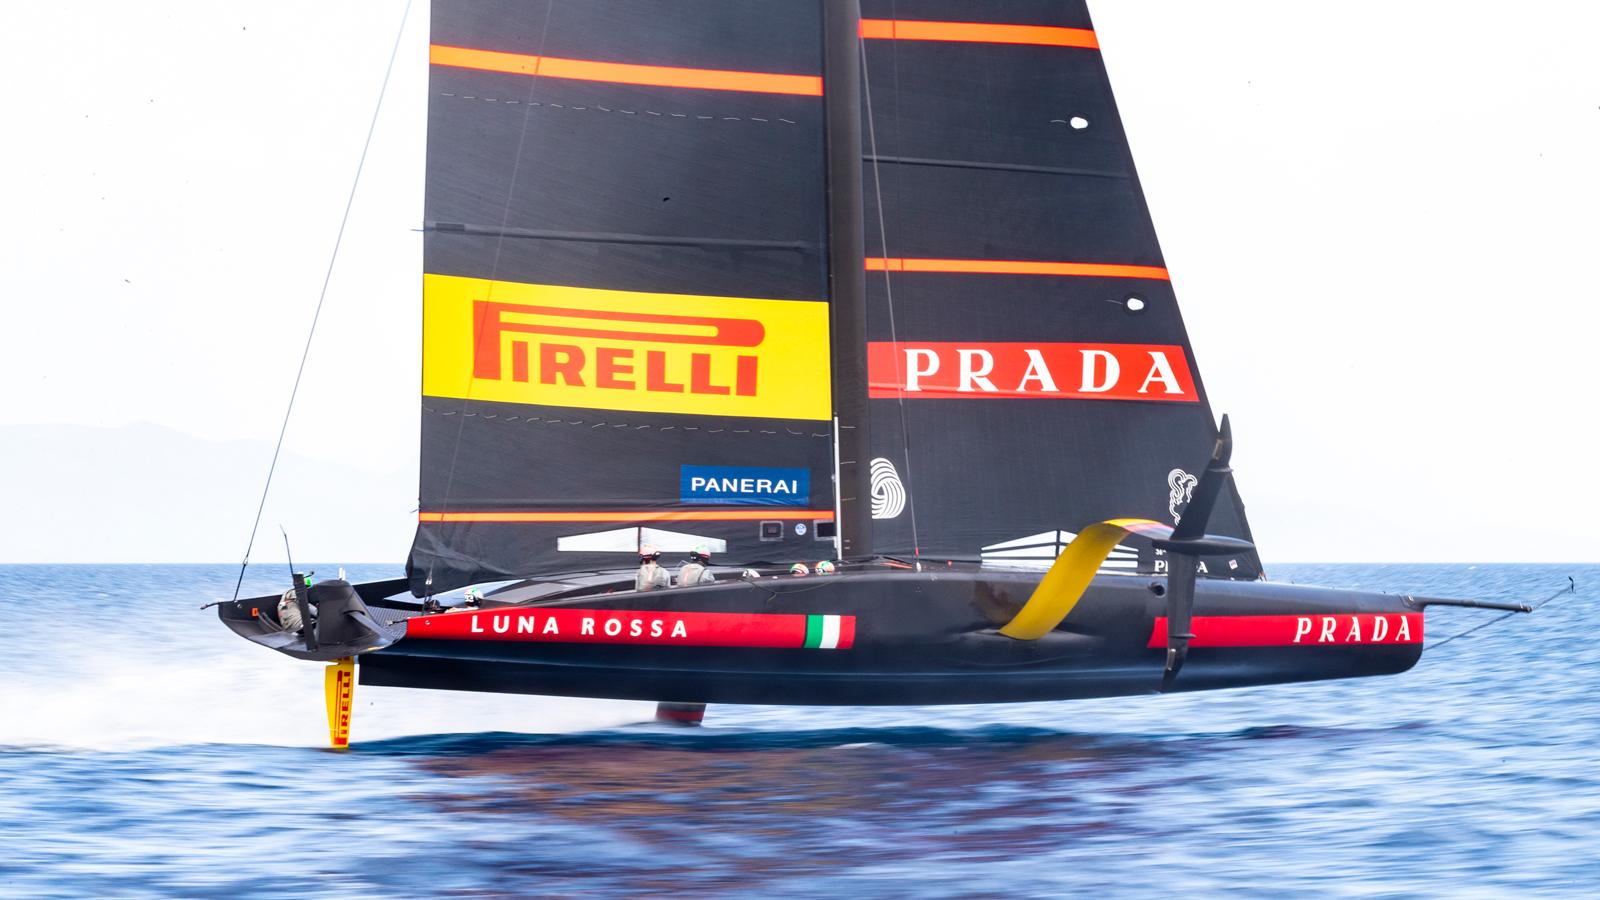 Luna Rossa Prada Pirelli Teams Background 6